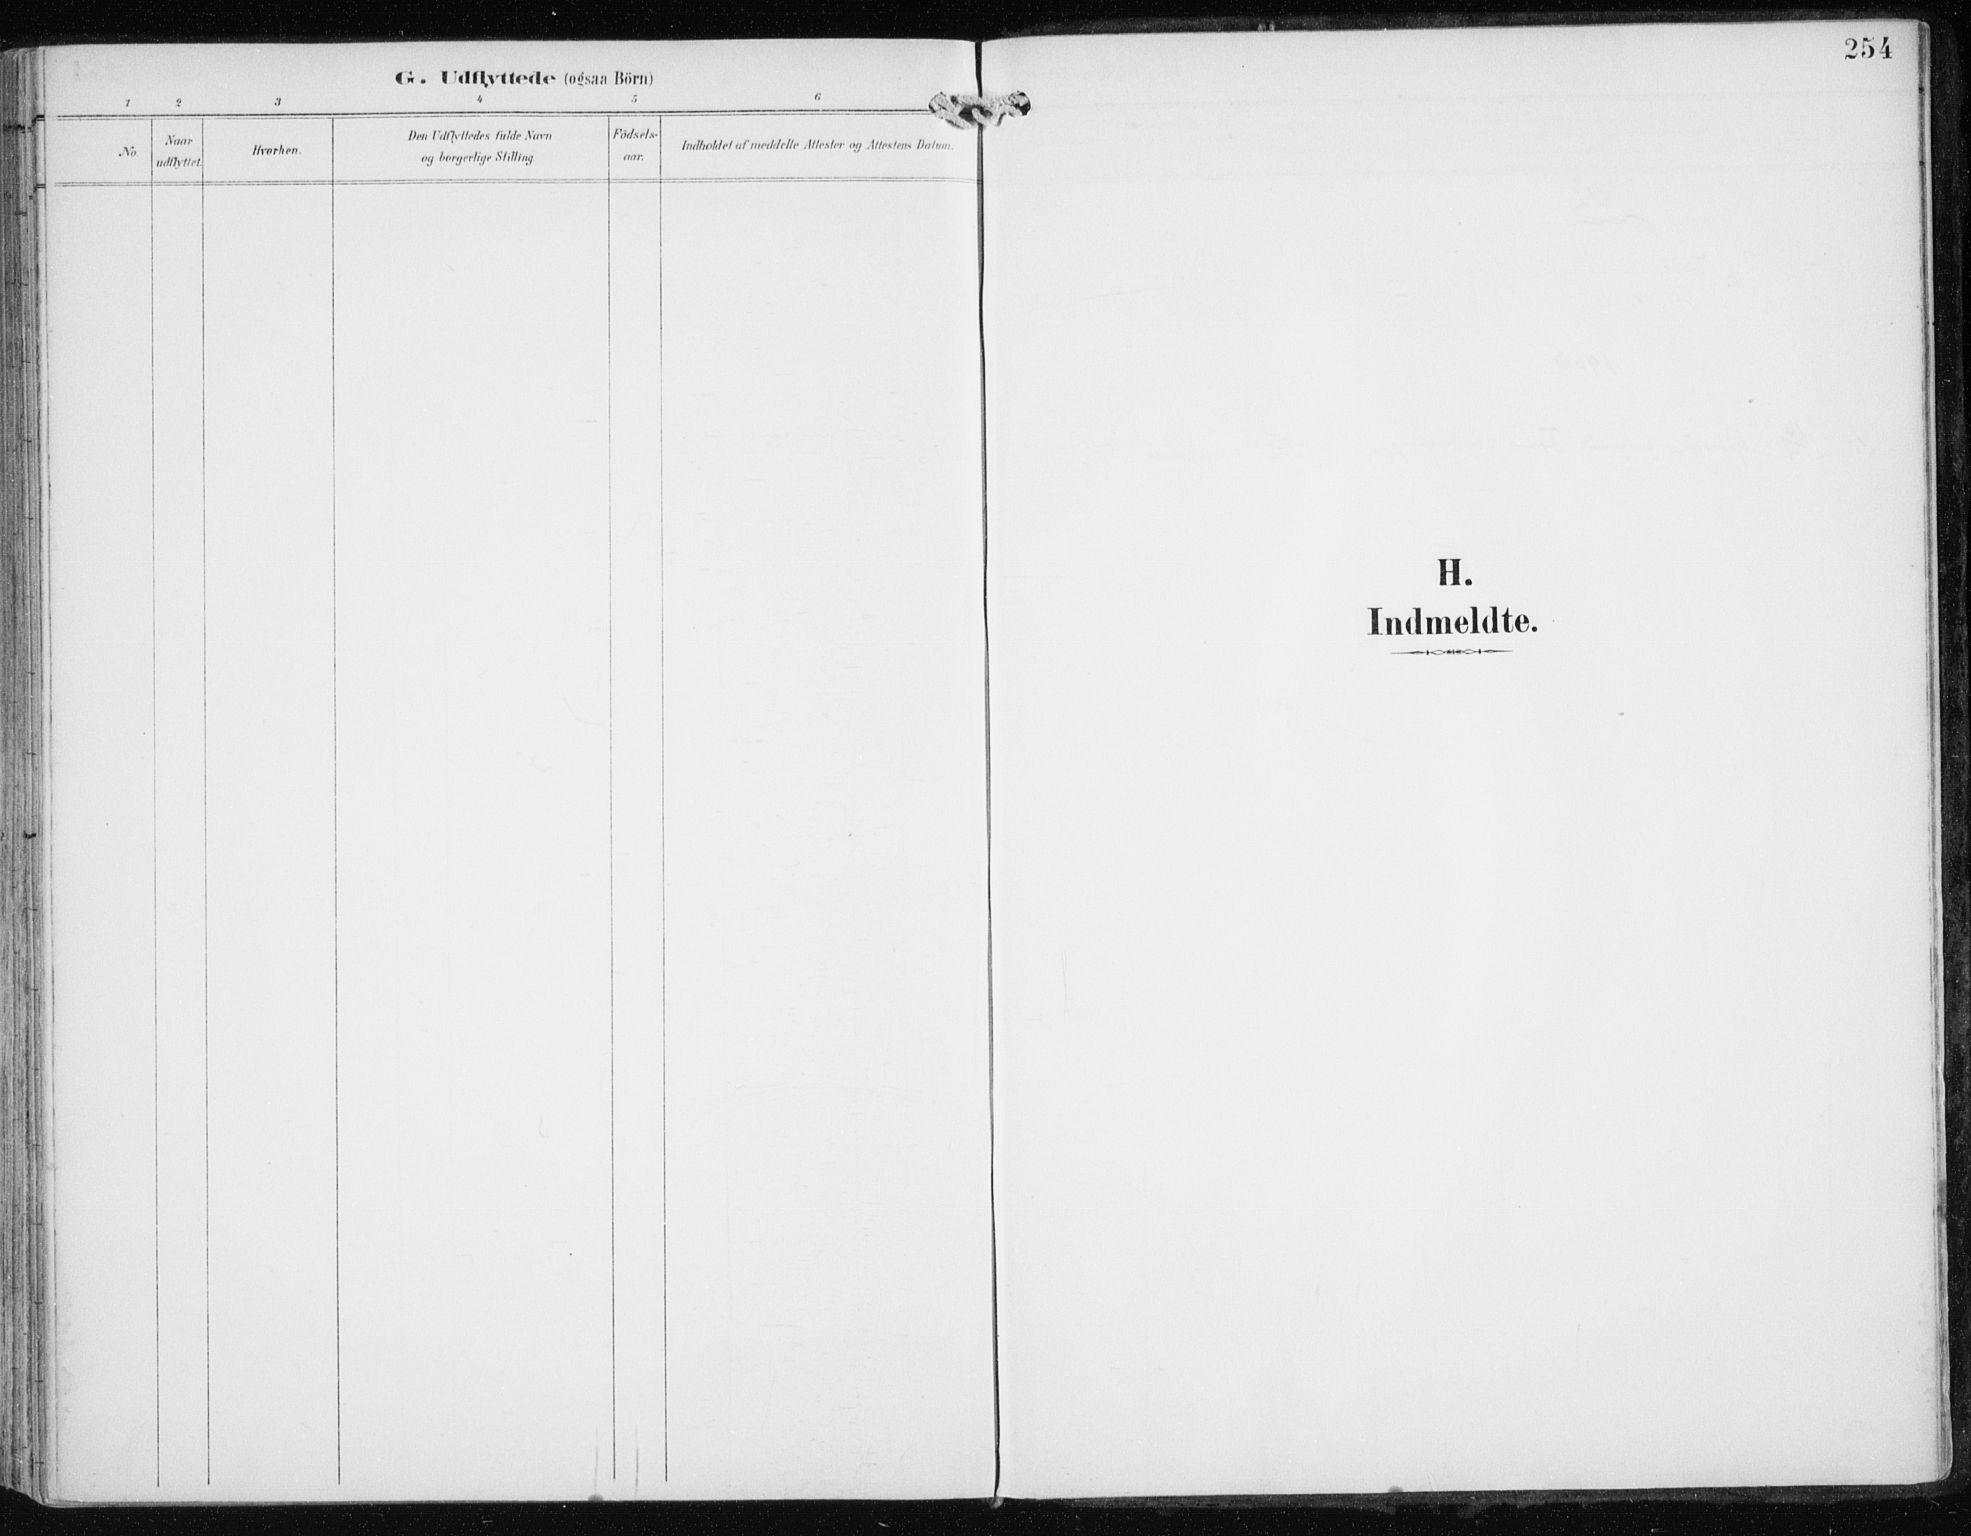 SATØ, Skjervøy sokneprestkontor, H/Ha/Haa/L0017kirke: Ministerialbok nr. 17, 1895-1911, s. 254